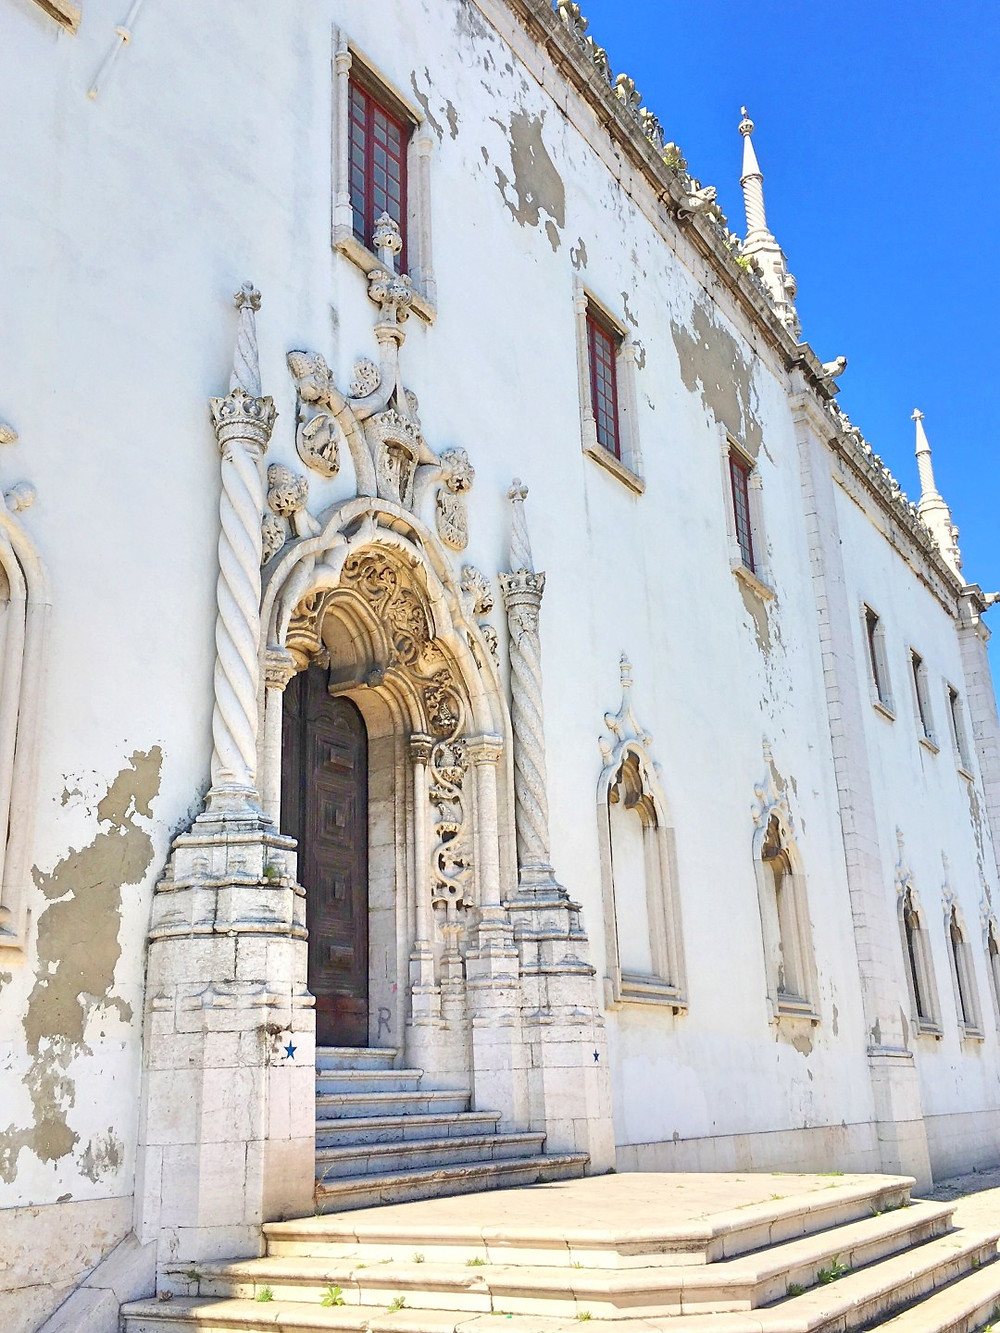 facade of Lisbon's National Tile Museum with a Manueline door